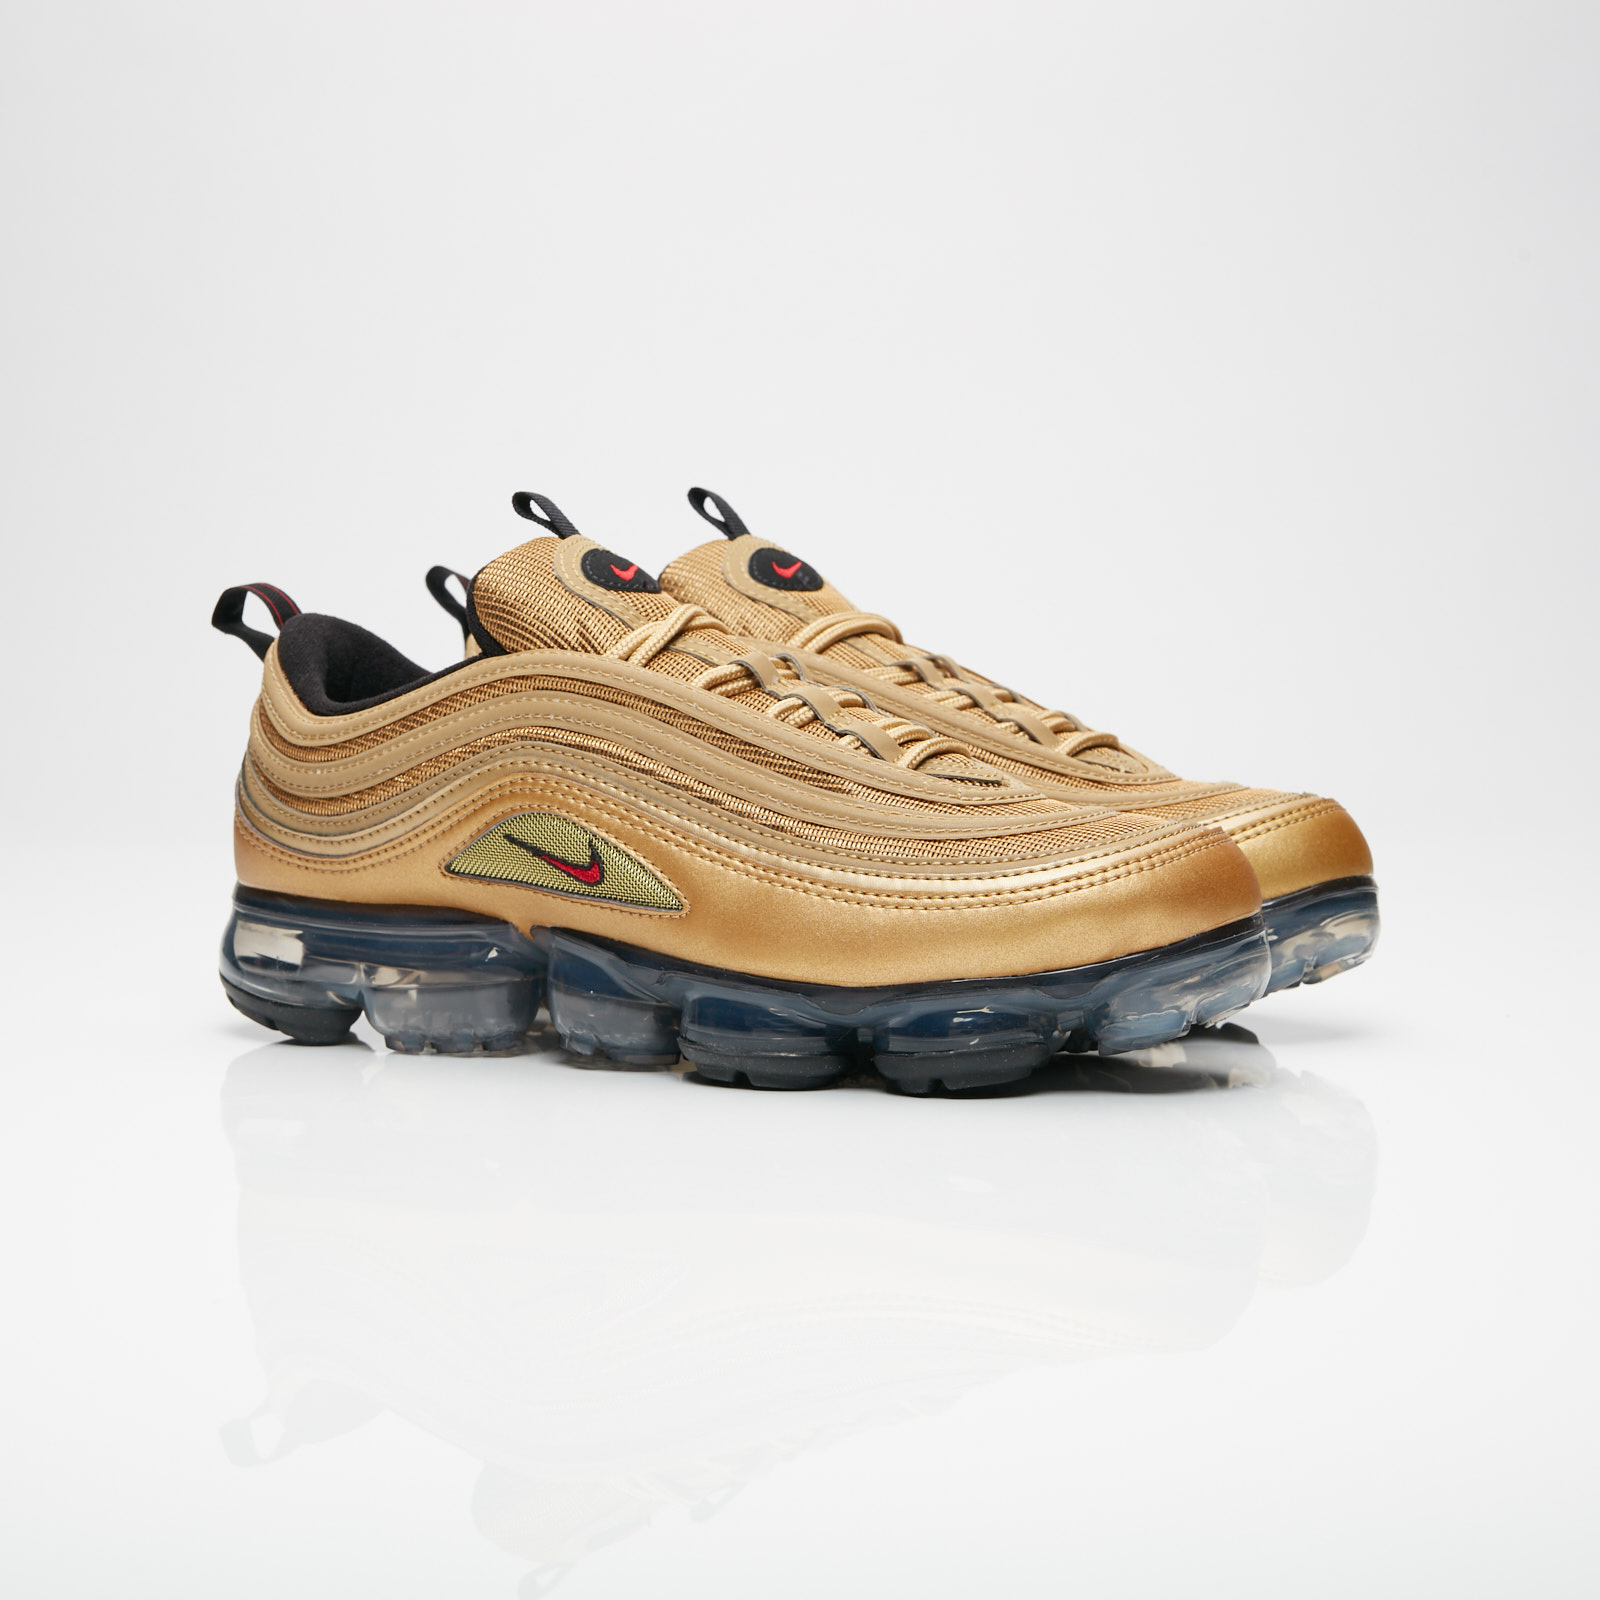 301d79cb4f Nike Air VaporMax 97 - Aj7291-700 - Sneakersnstuff | sneakers ...